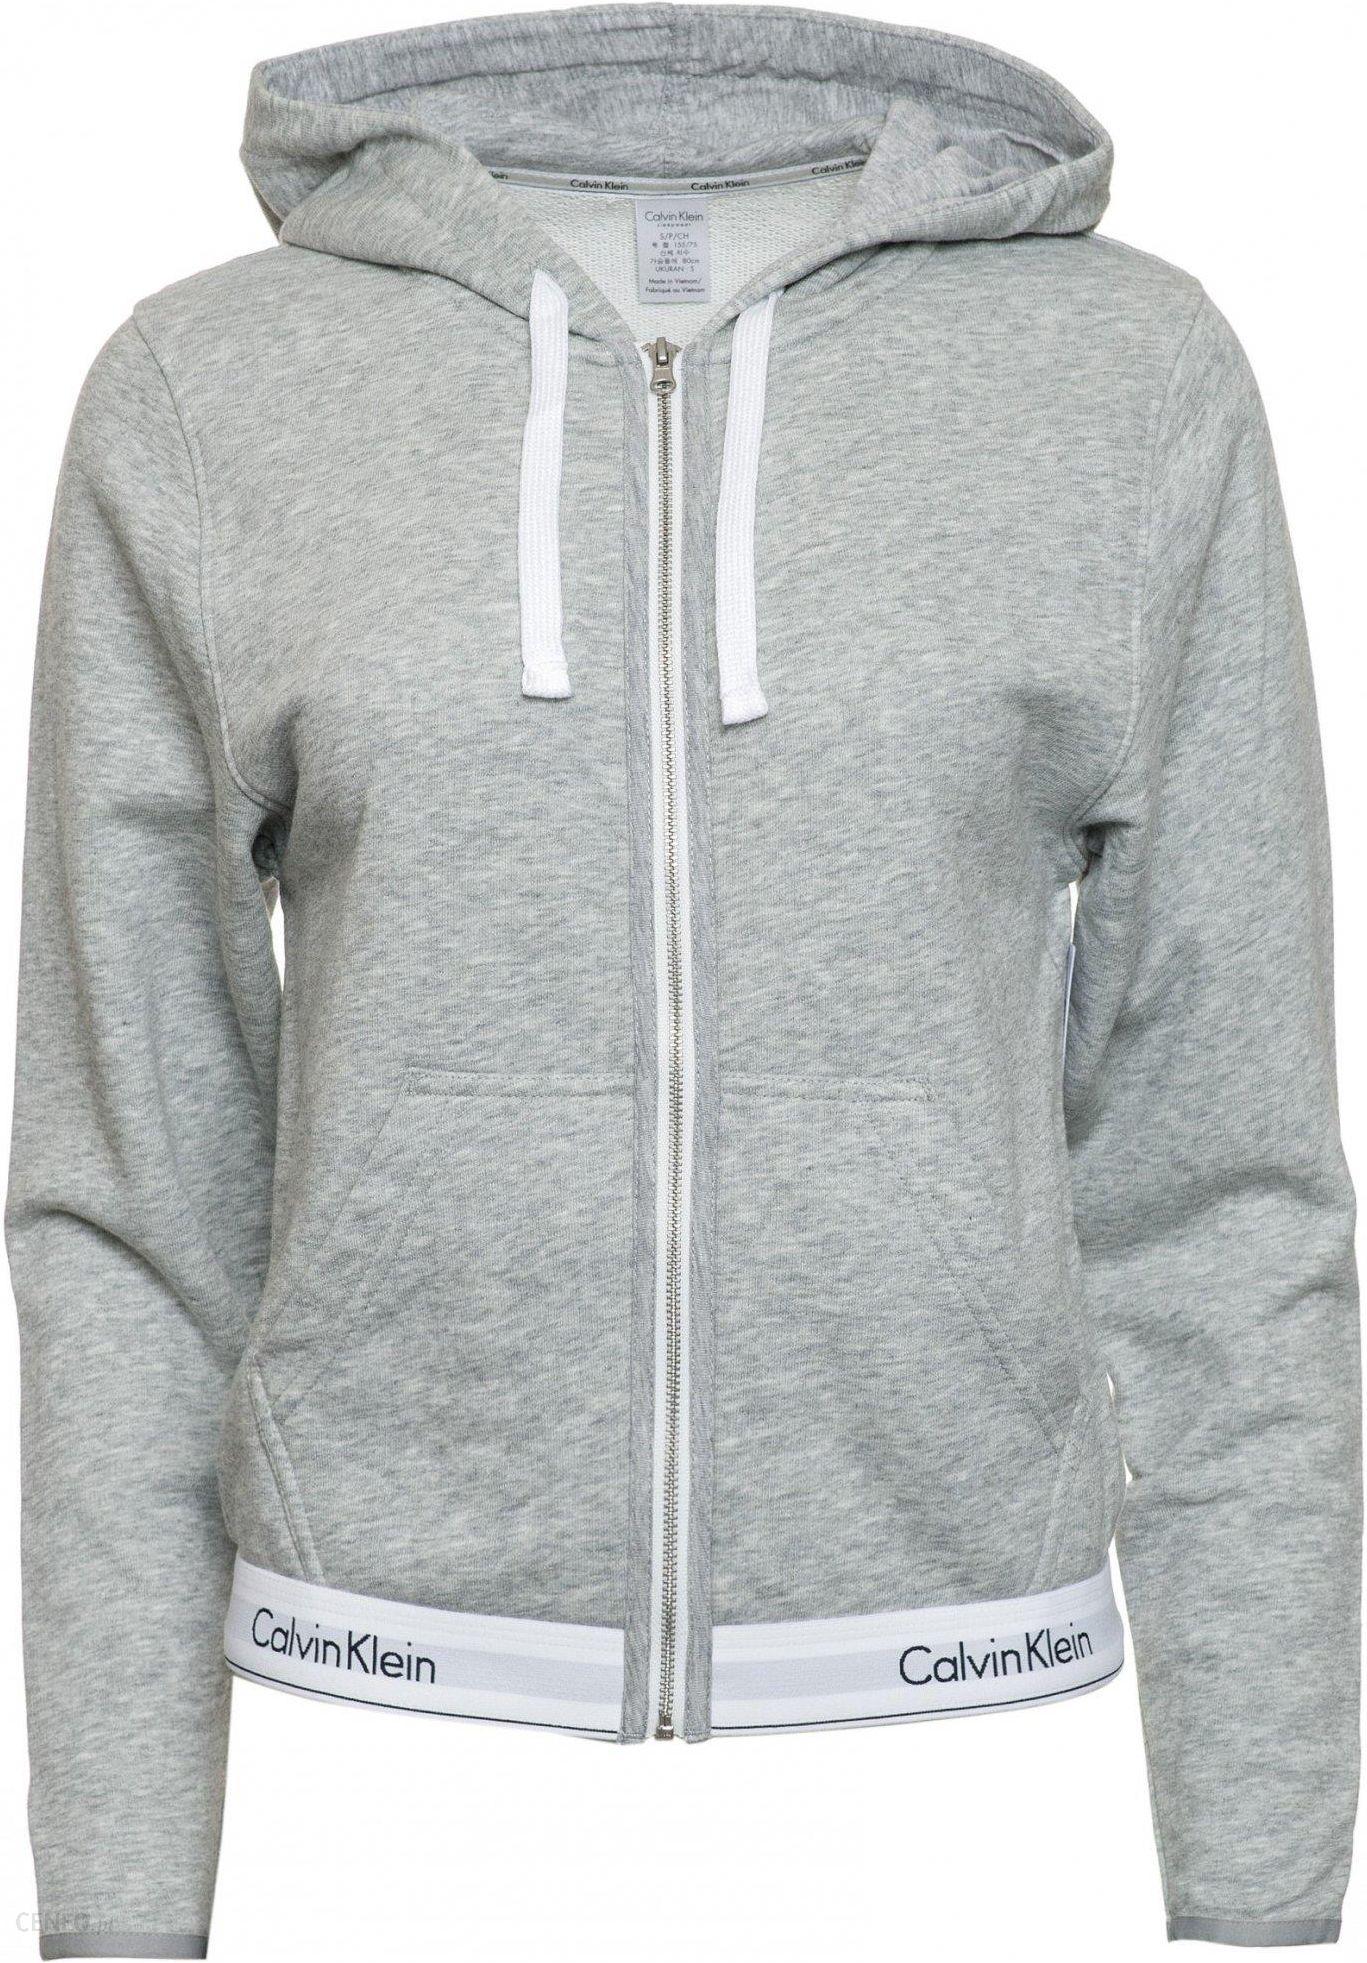 c07e3c1b150 Calvin Klein bluza damska XS szary - Ceny i opinie - Ceneo.pl